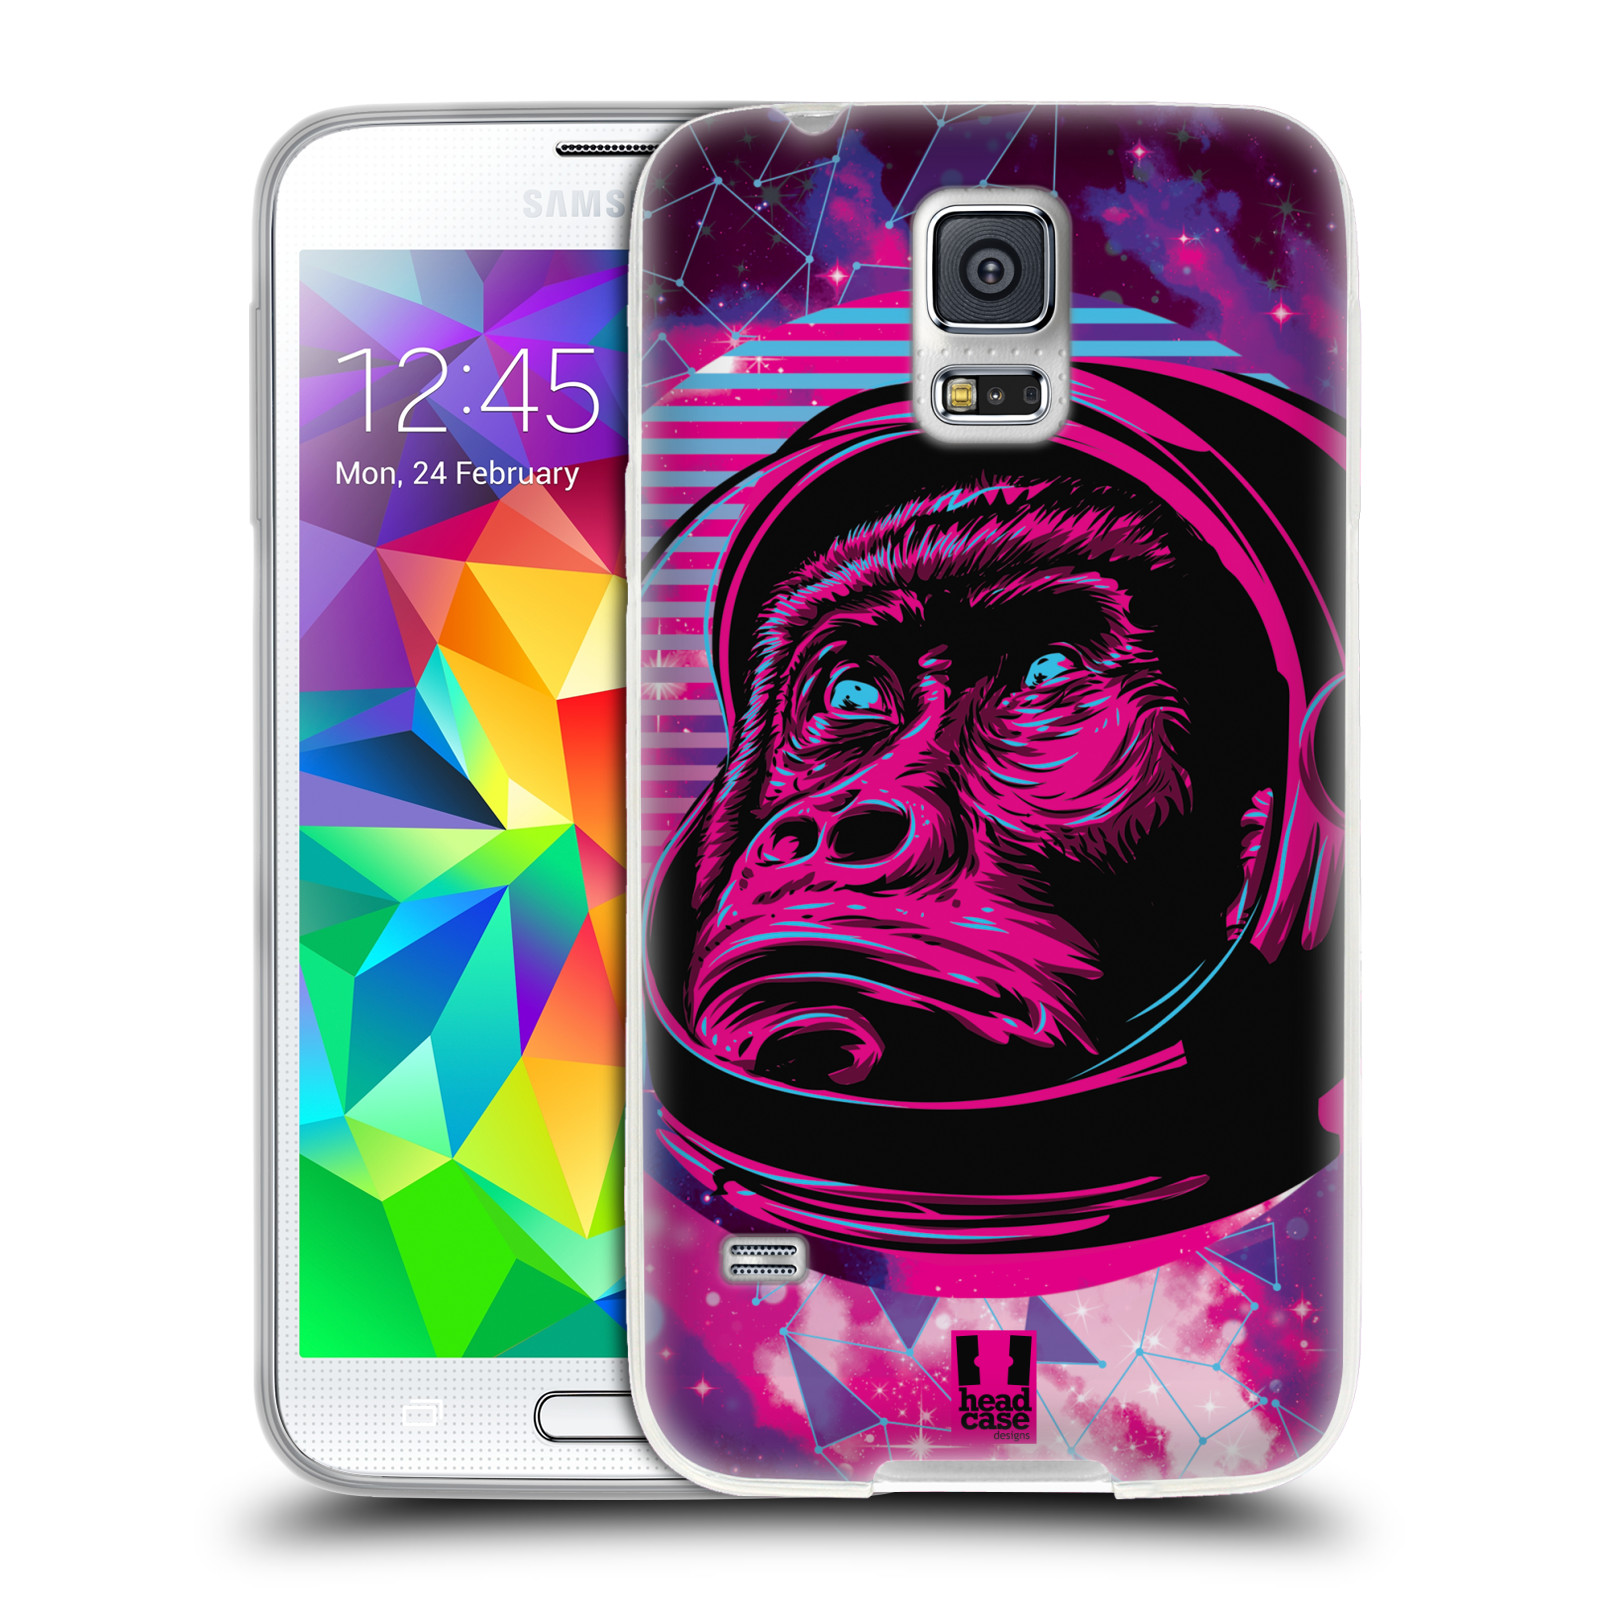 Silikonové pouzdro na mobil Samsung Galaxy S5 Neo Head Case - Gorila ve skafandru